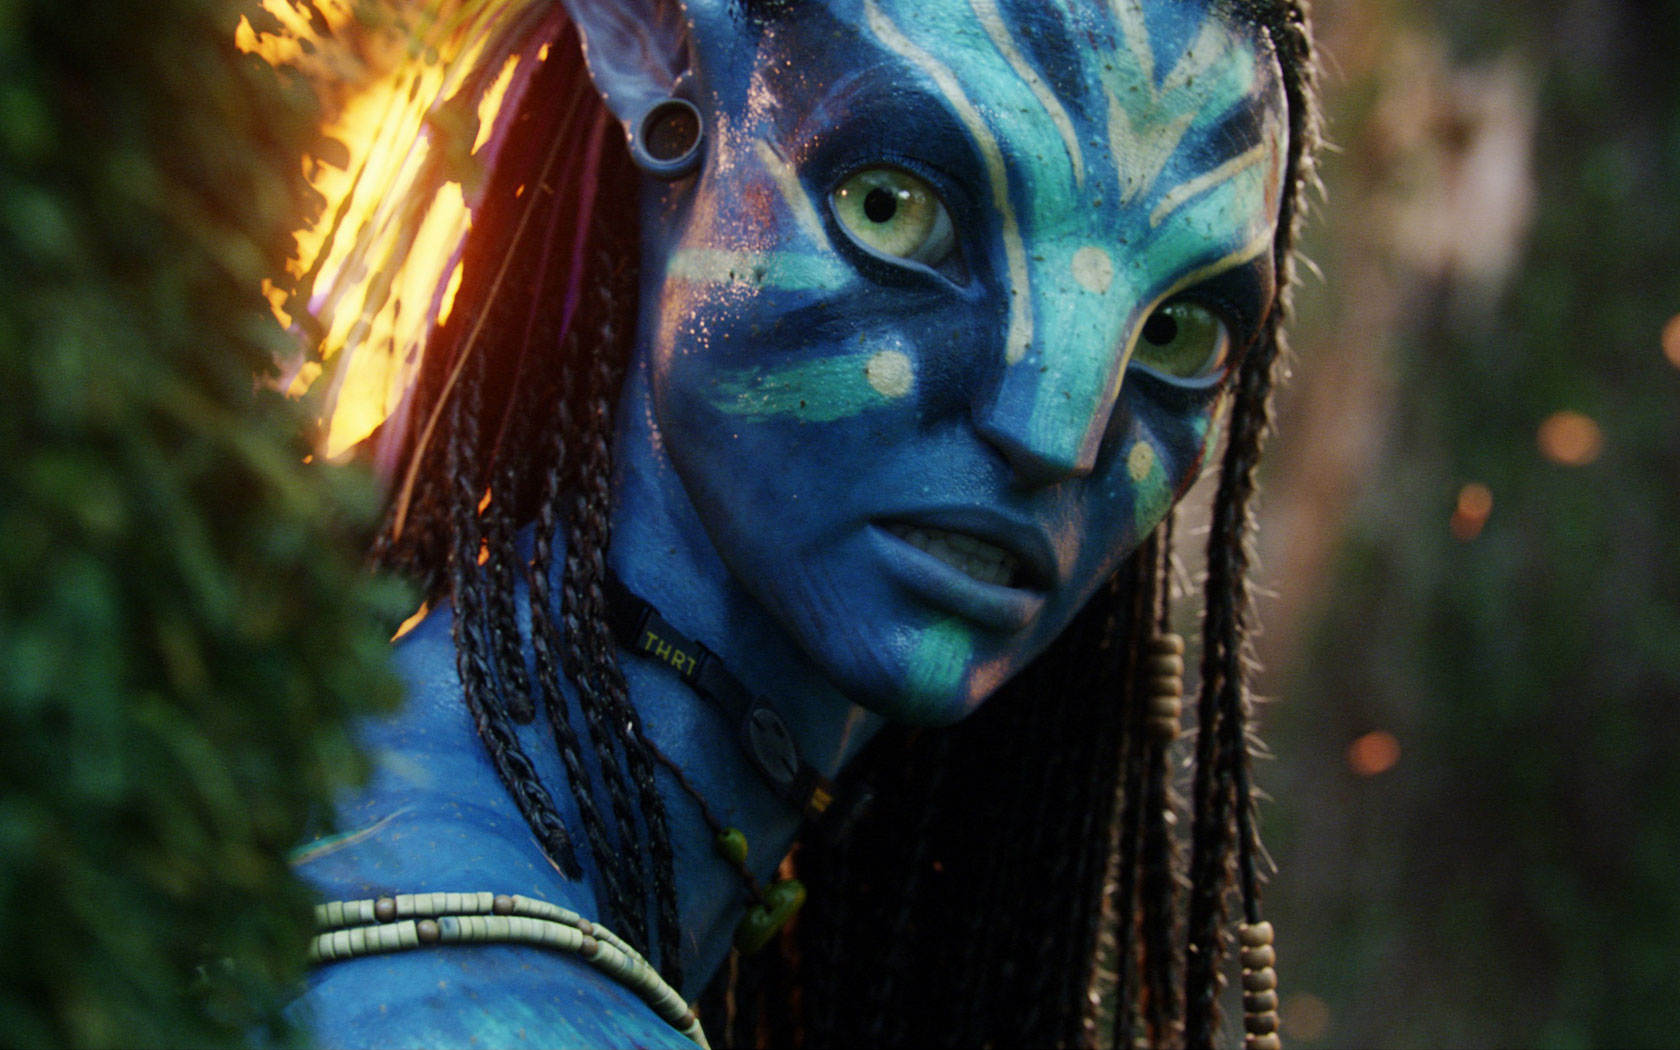 Jon landau further indicates delay on 'avatar 2'